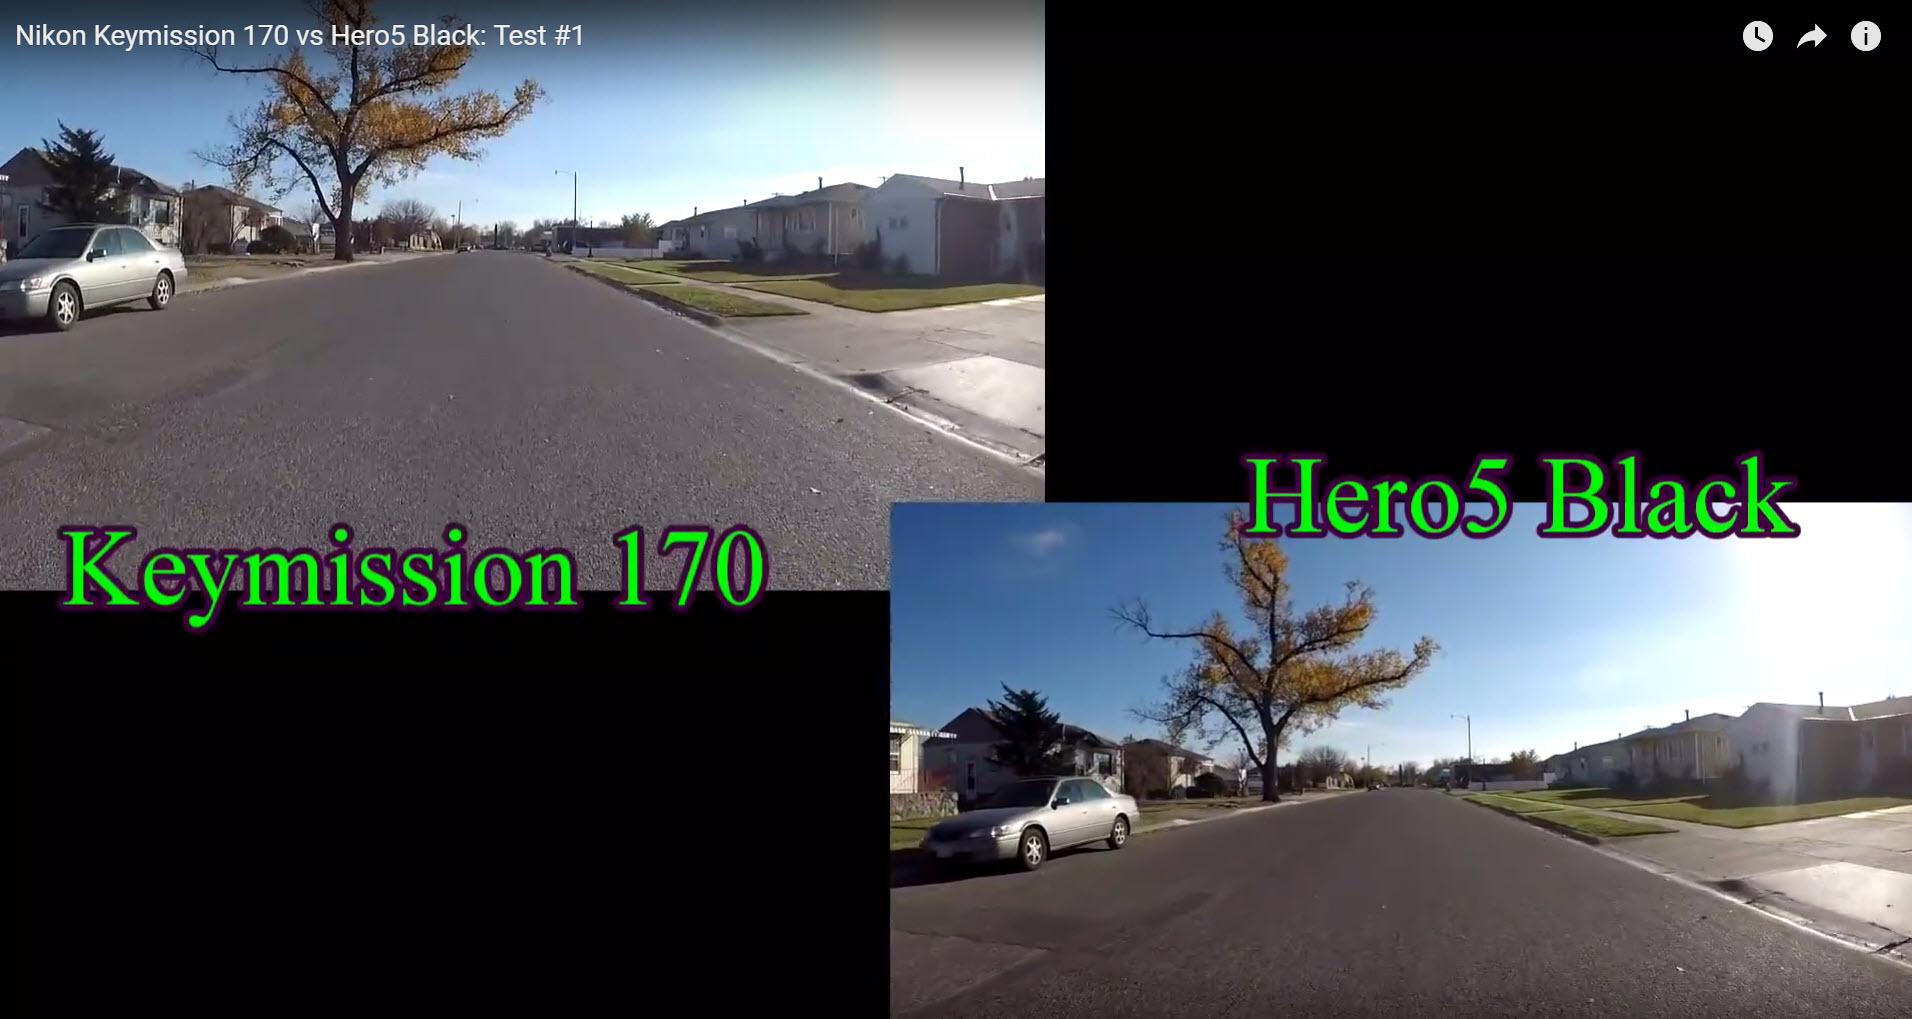 hero5 balck keymission170 test